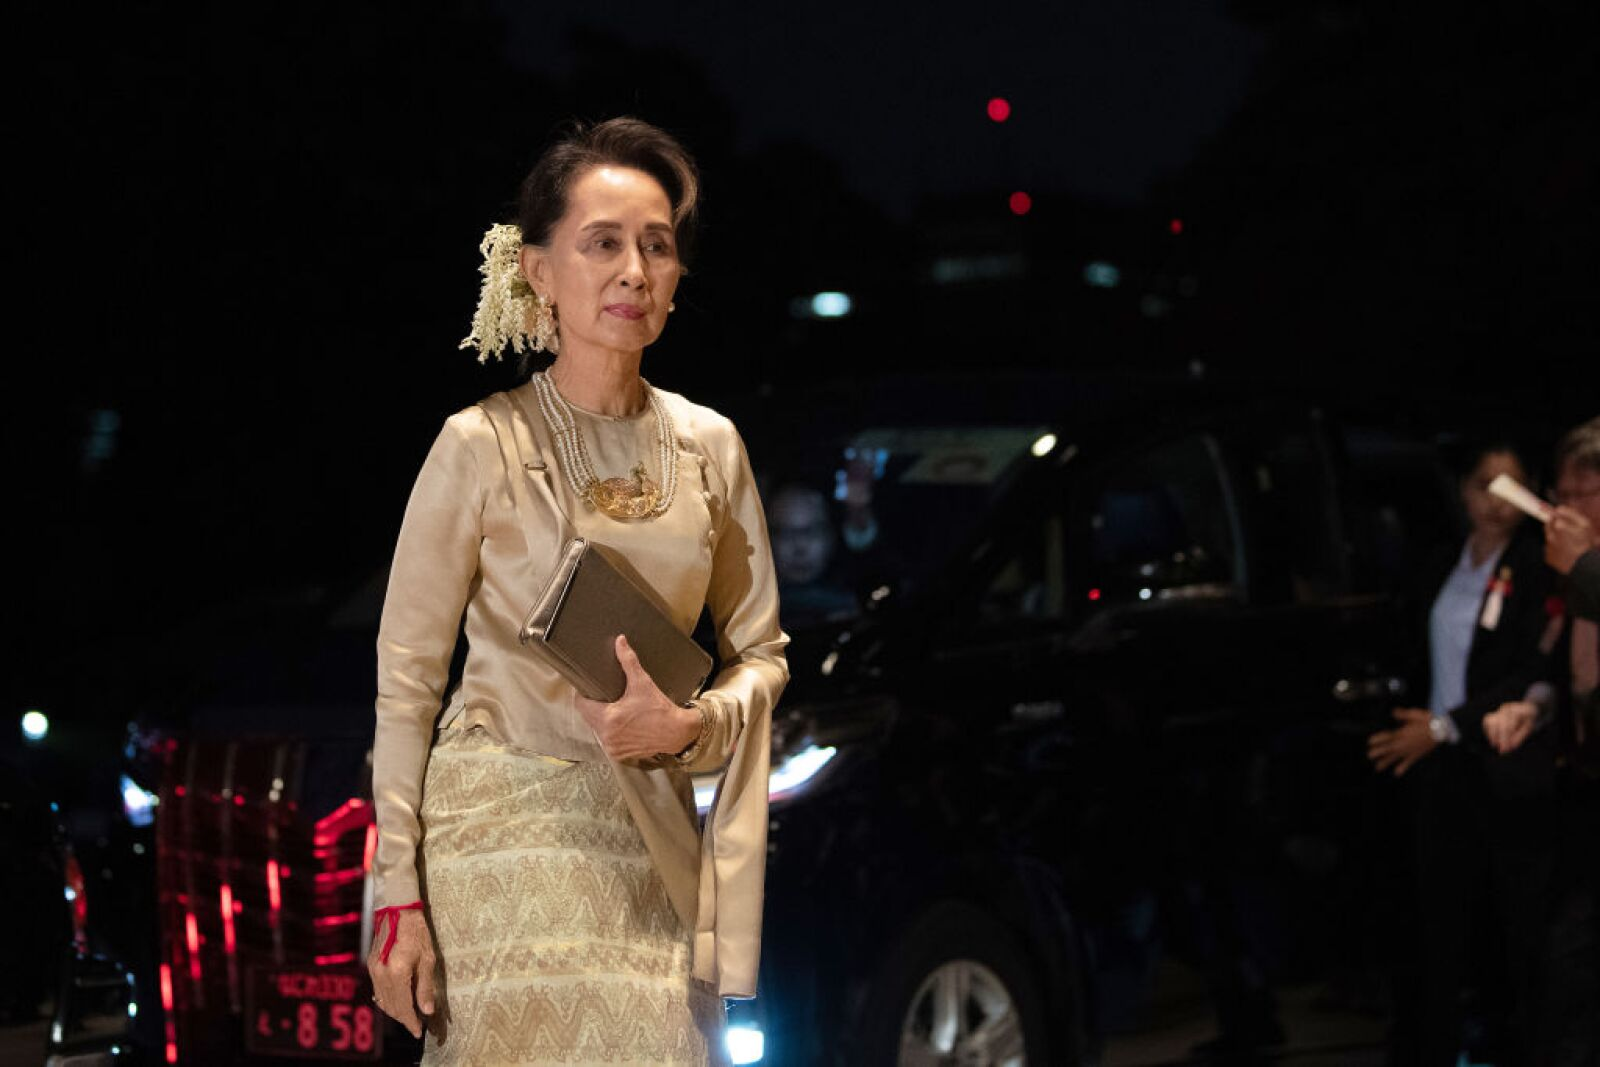 El líder de Myanmar, Aung San Suu Kyi